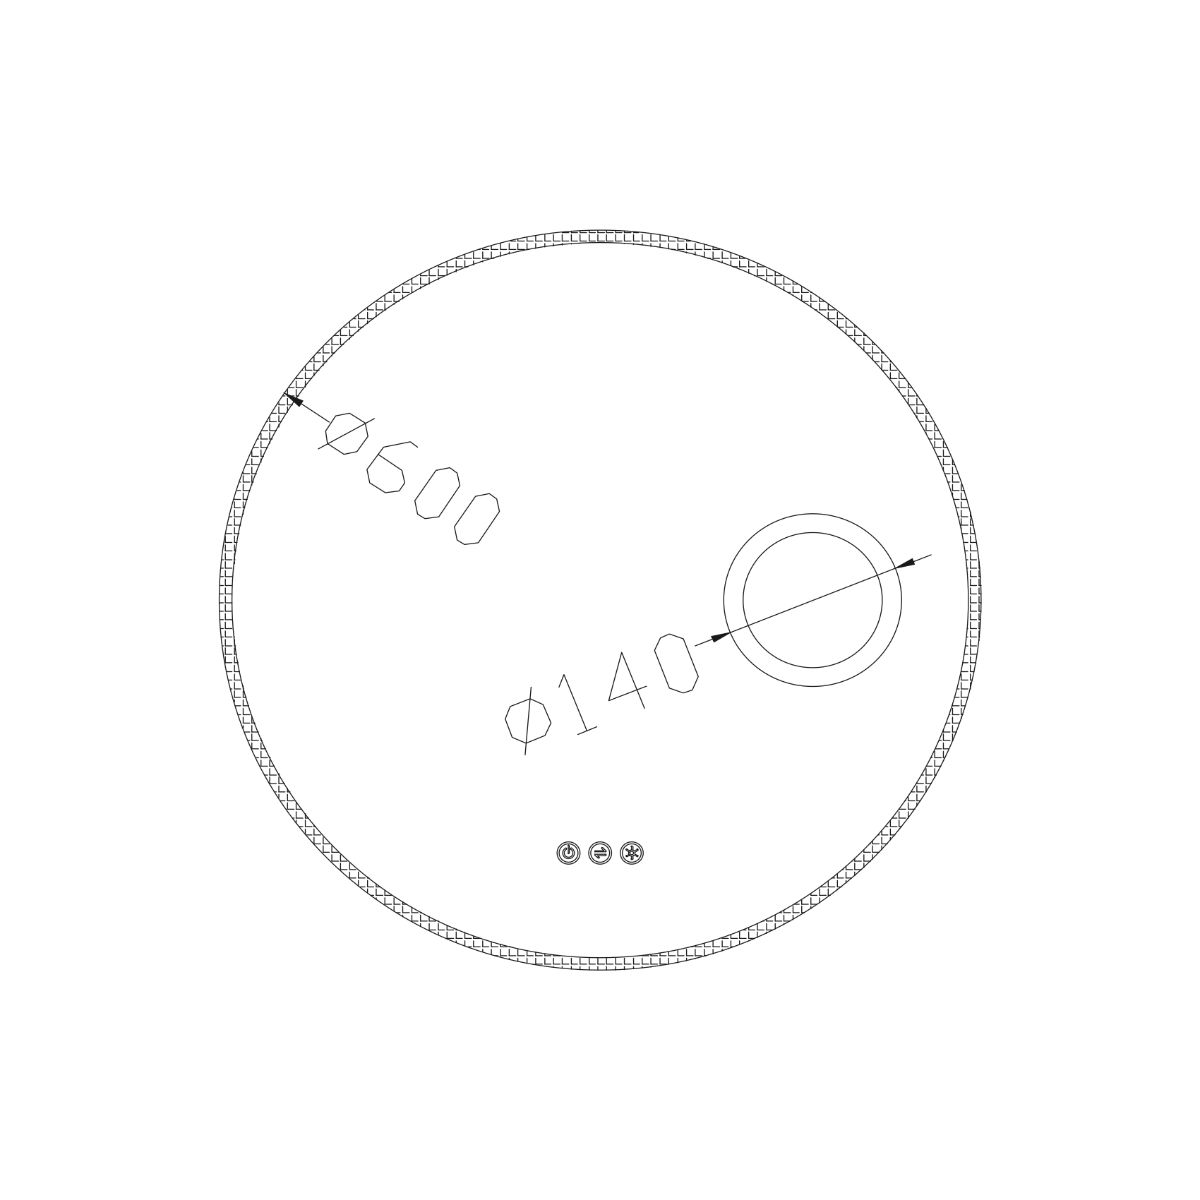 allureultraslimroundledilluminatedmirrorwithmagnifier600mmdimensions